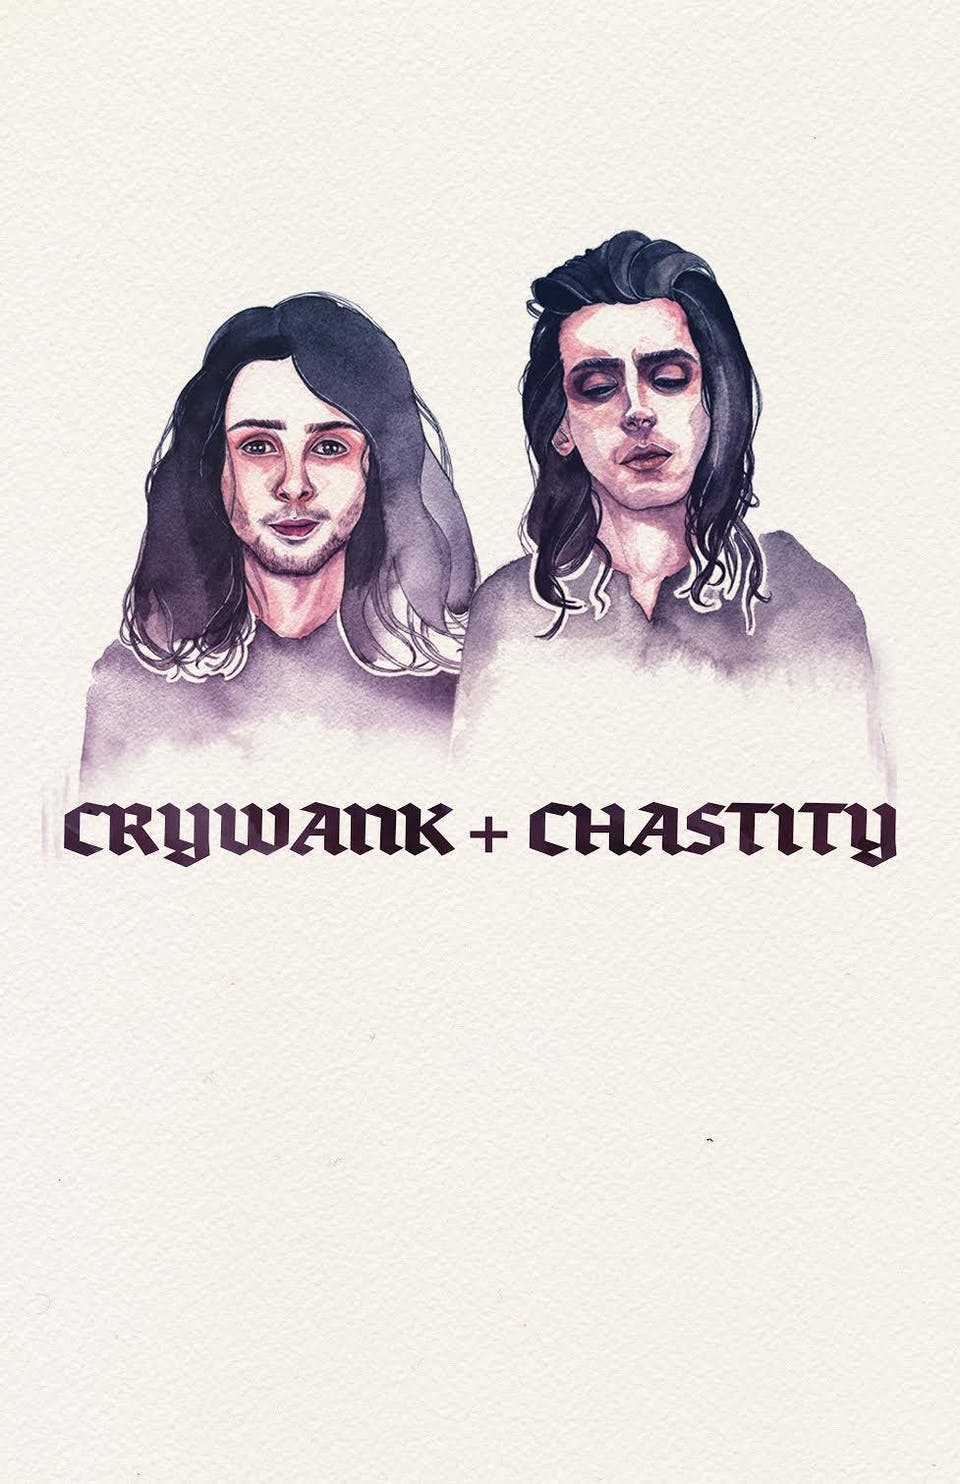 Crywank + Chastity